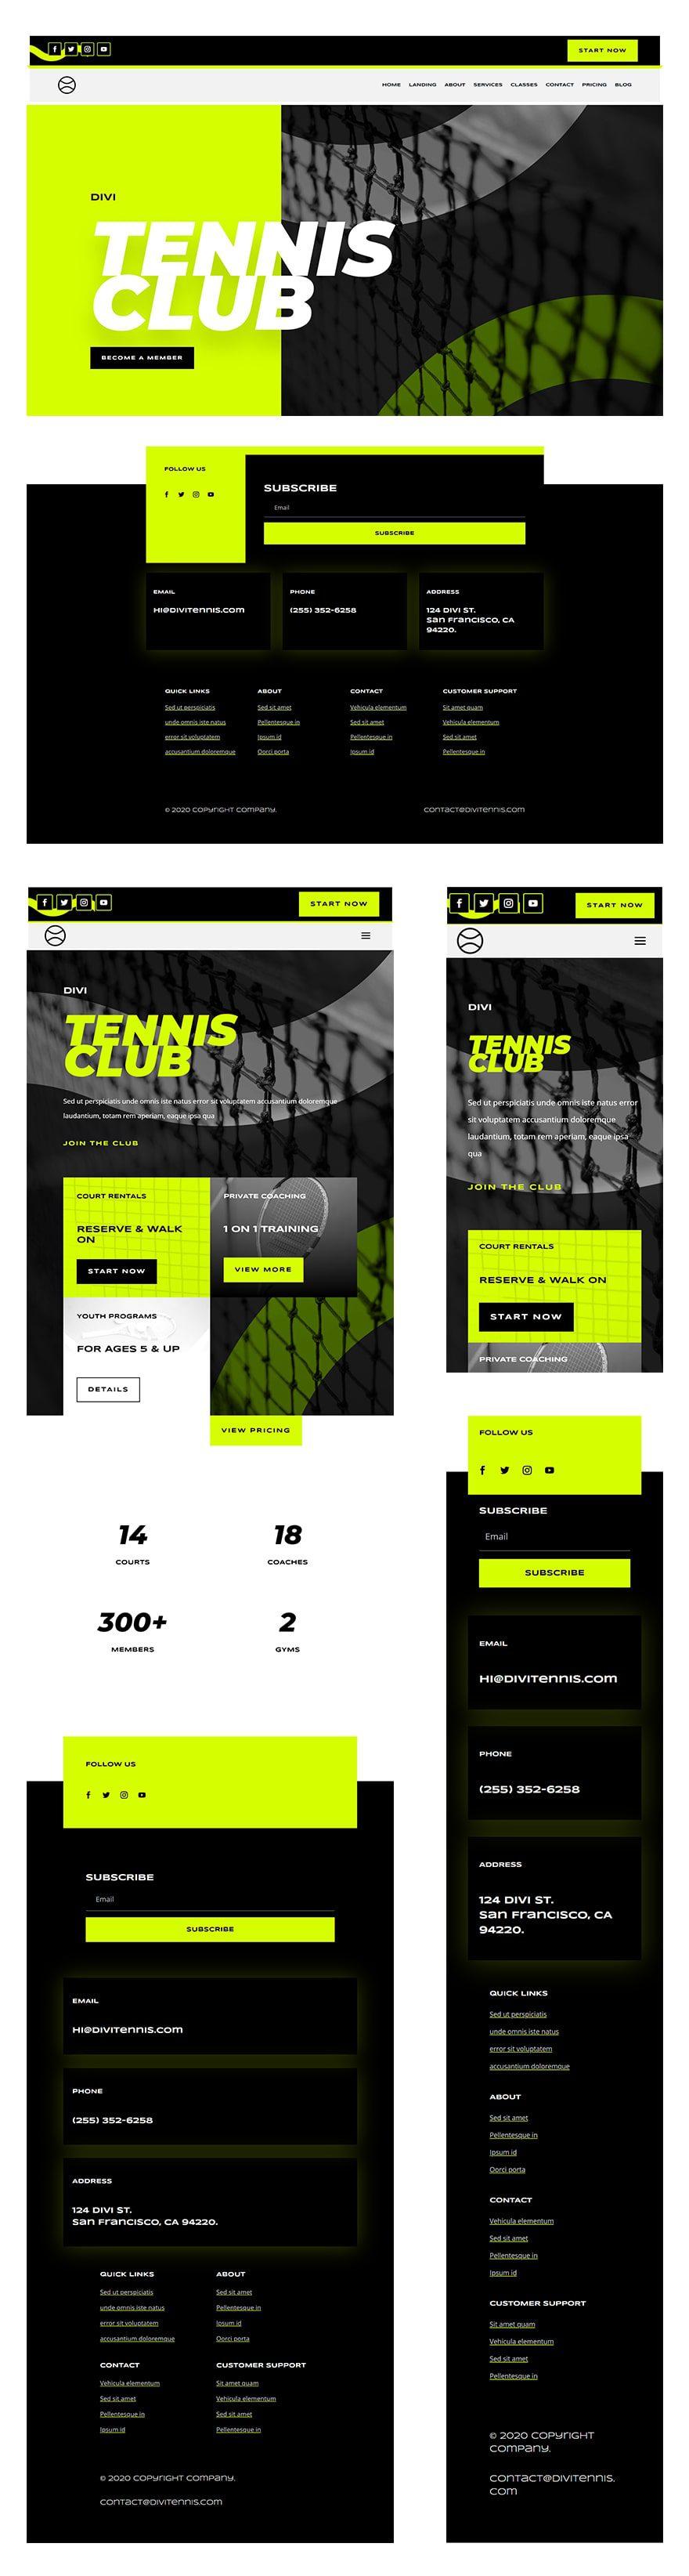 tennis club header footer